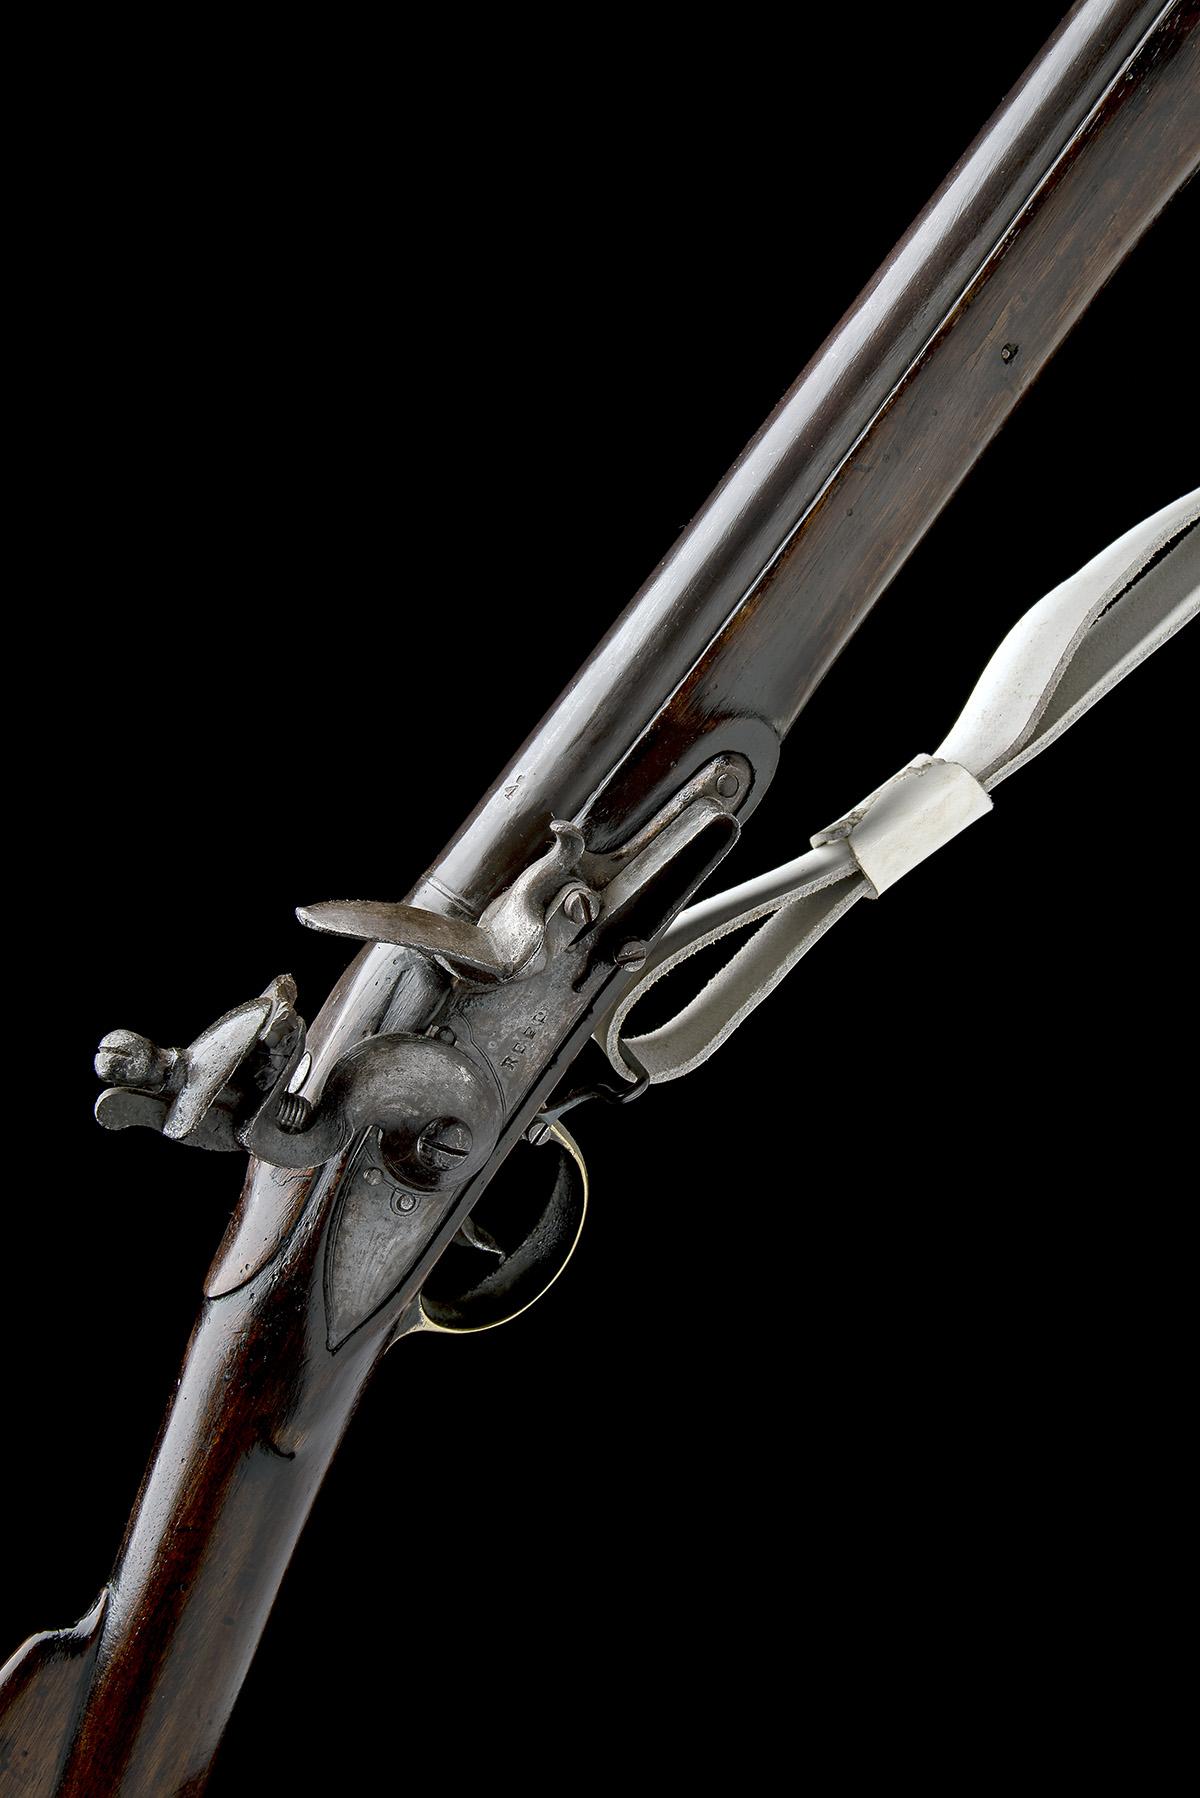 REED, LONDON A .750 FLINTLOCK MUSKET, MODEL 'INDIA PATTERN BROWN BESS', rack no. 47, WITH BAYONET,